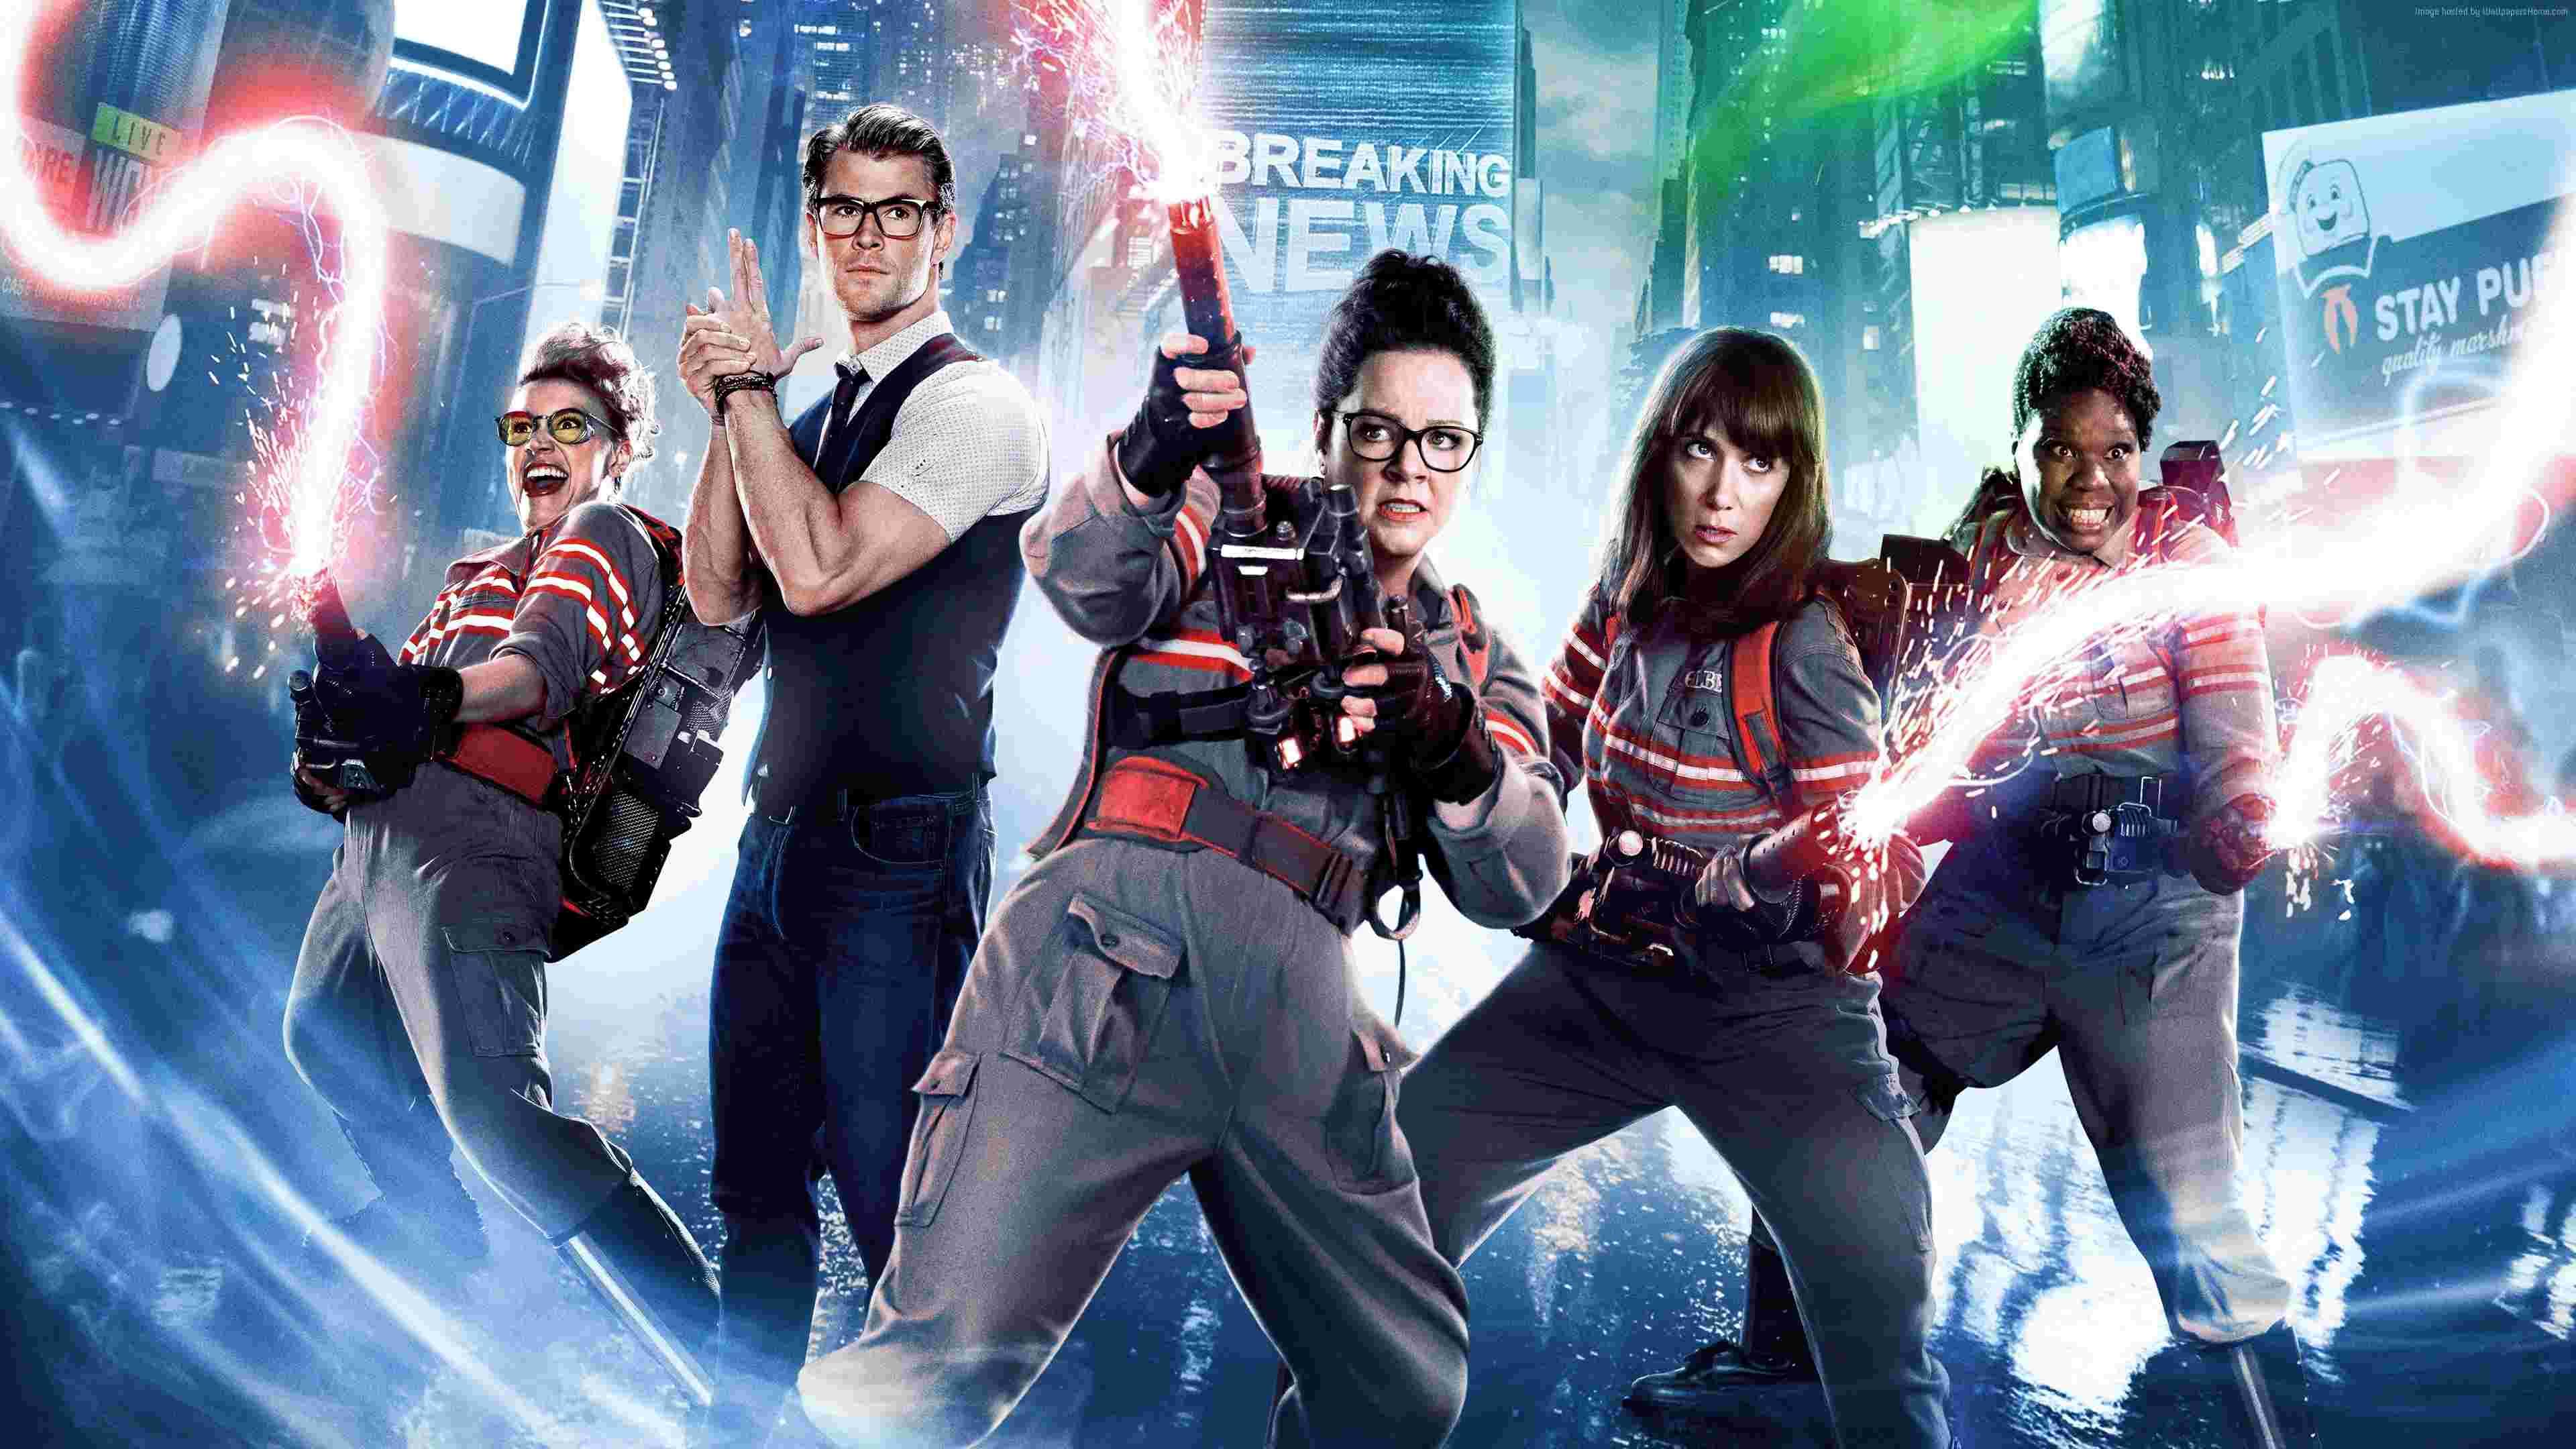 ghostbusters-2016-movie-cast-4k-uhd